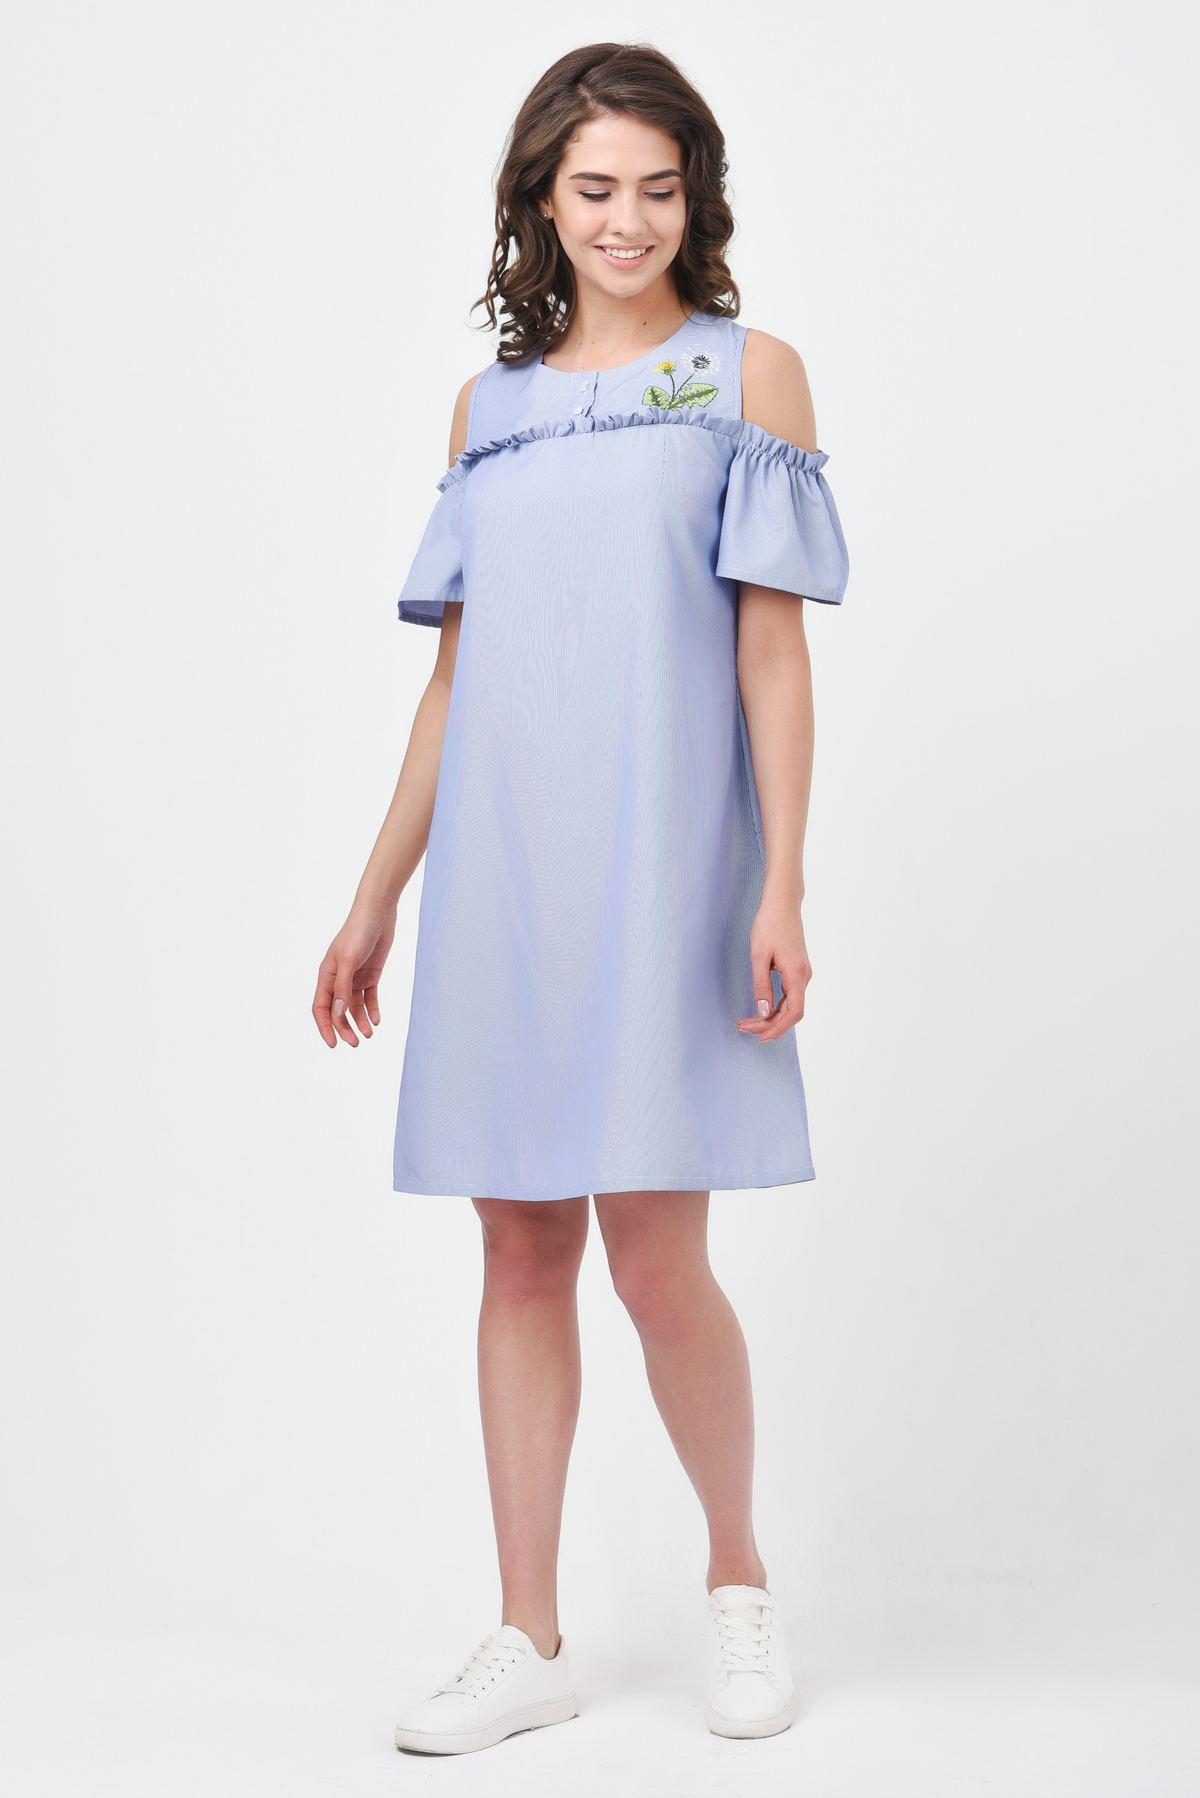 fbe0968e96a Летнее платье с открытыми плечами RM1186-18DD